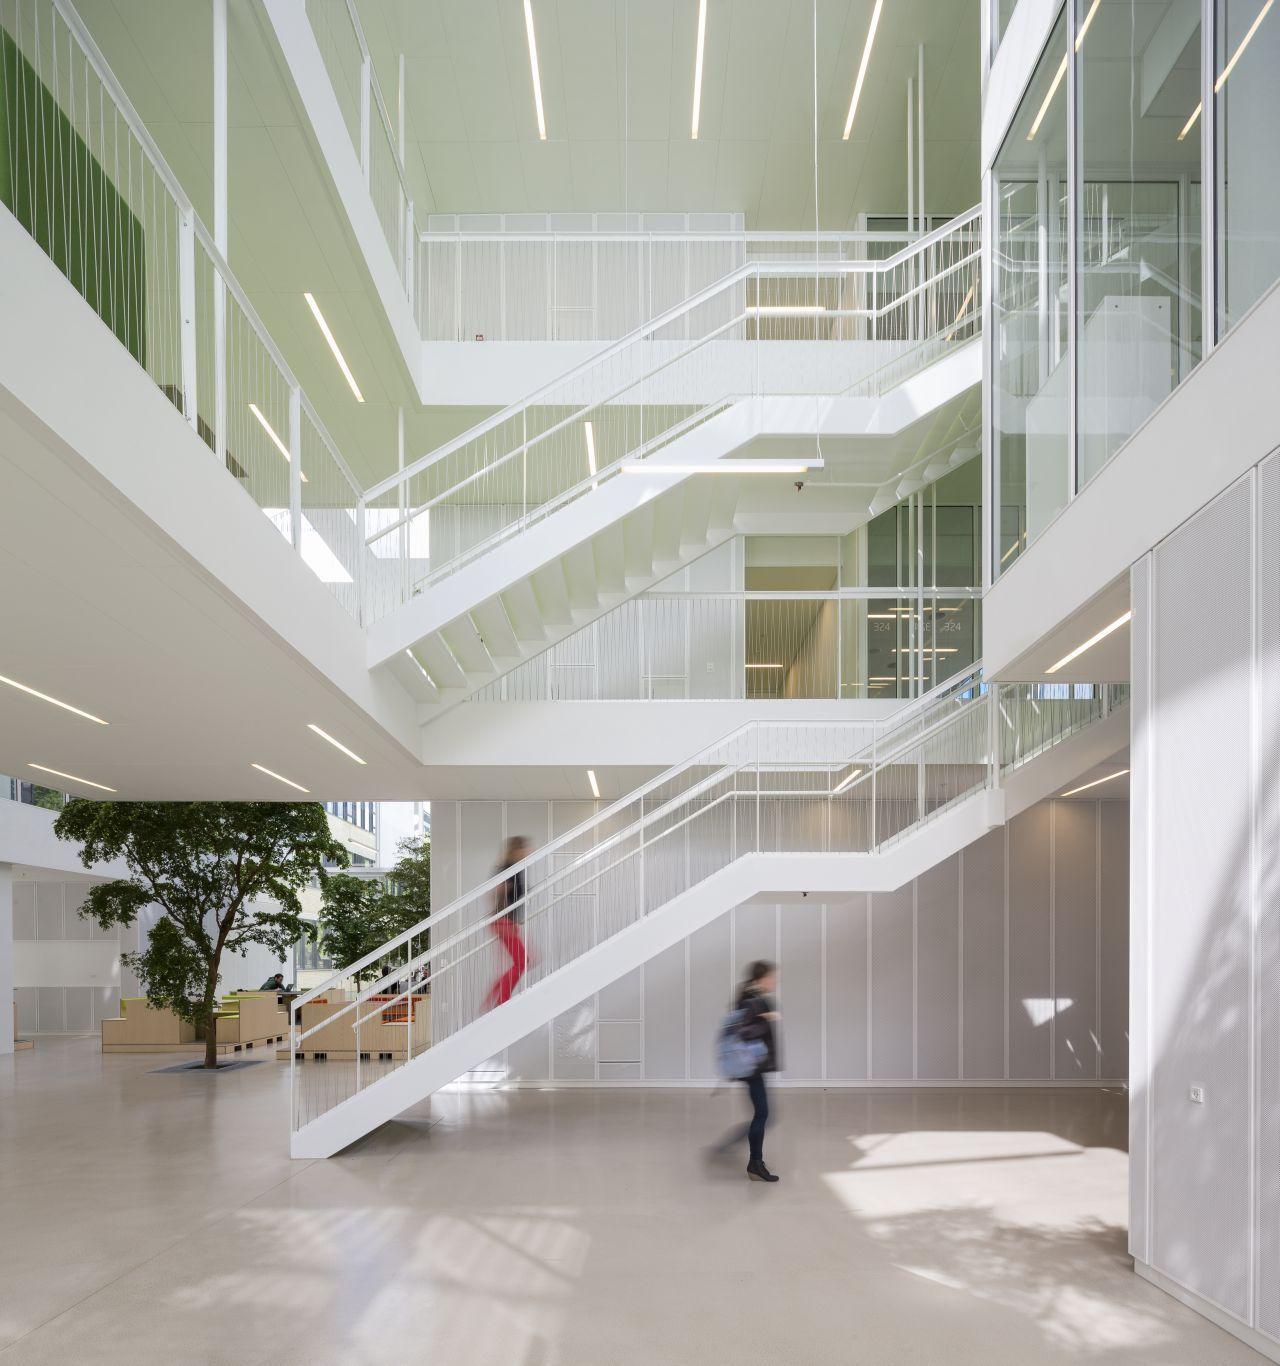 Complexo de Pesquisa e Ensino - DTU Compute / Christensen & Co Architects © Adam Mørk